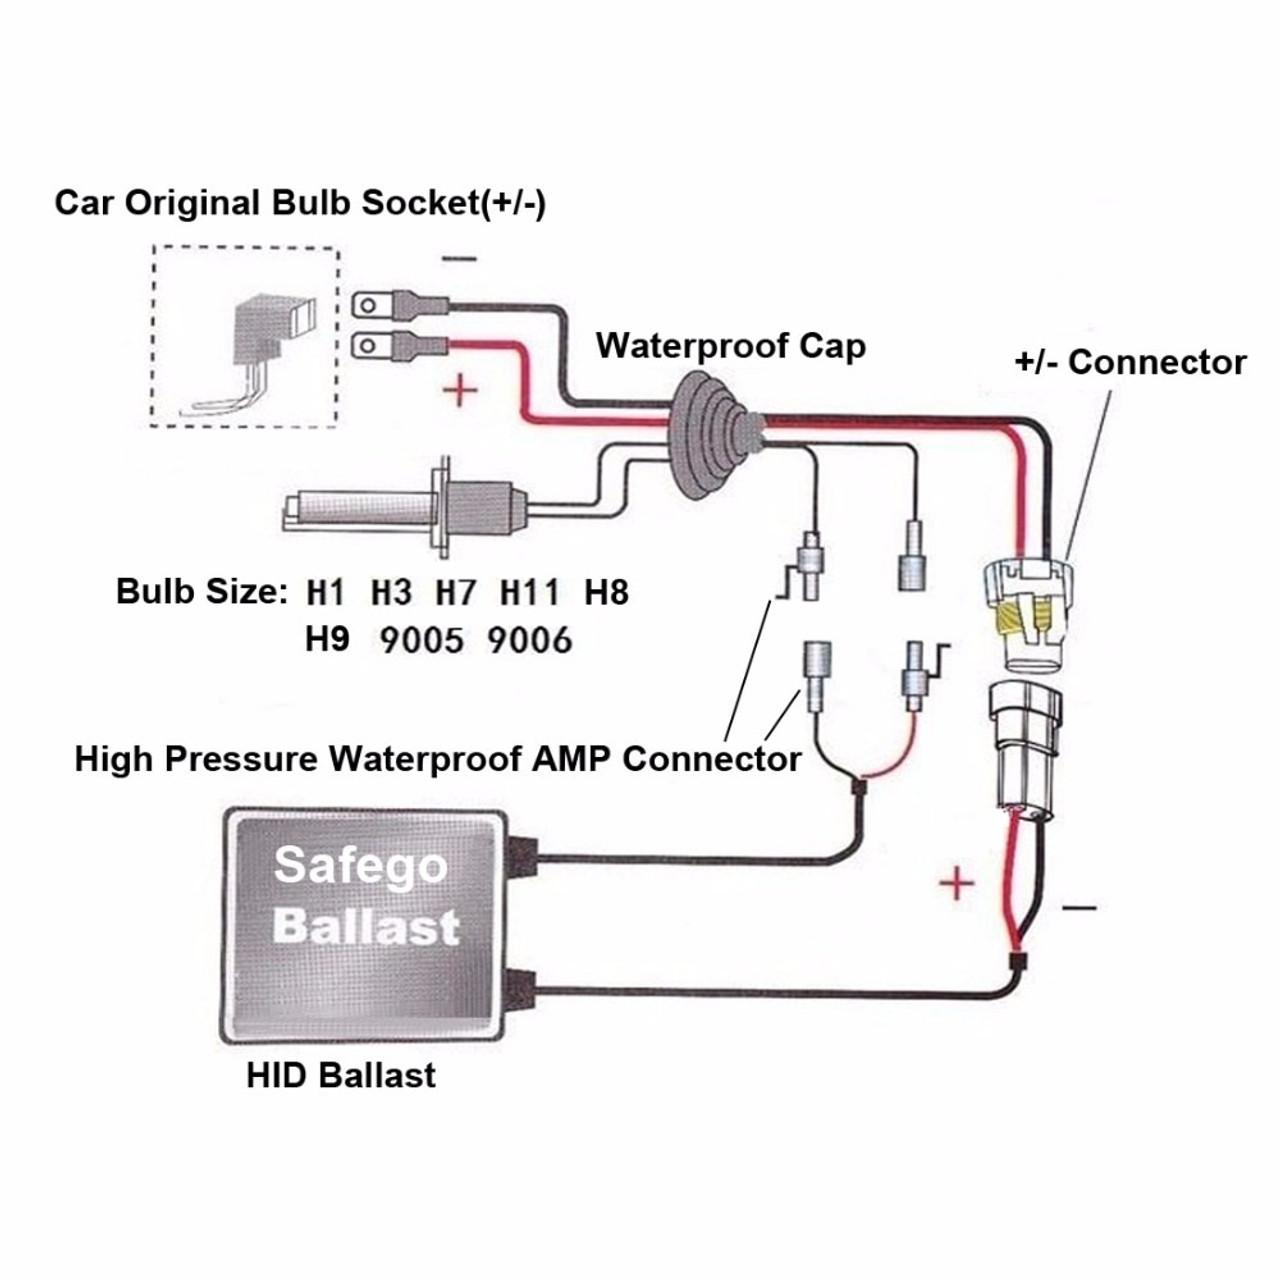 slim ballast hid kit xenon 35w h4 h7 h11 xenon hid conversion kit h1 corolla diy diy non hid 9005 9006 to h4 conversion diagram [ 1000 x 1000 Pixel ]